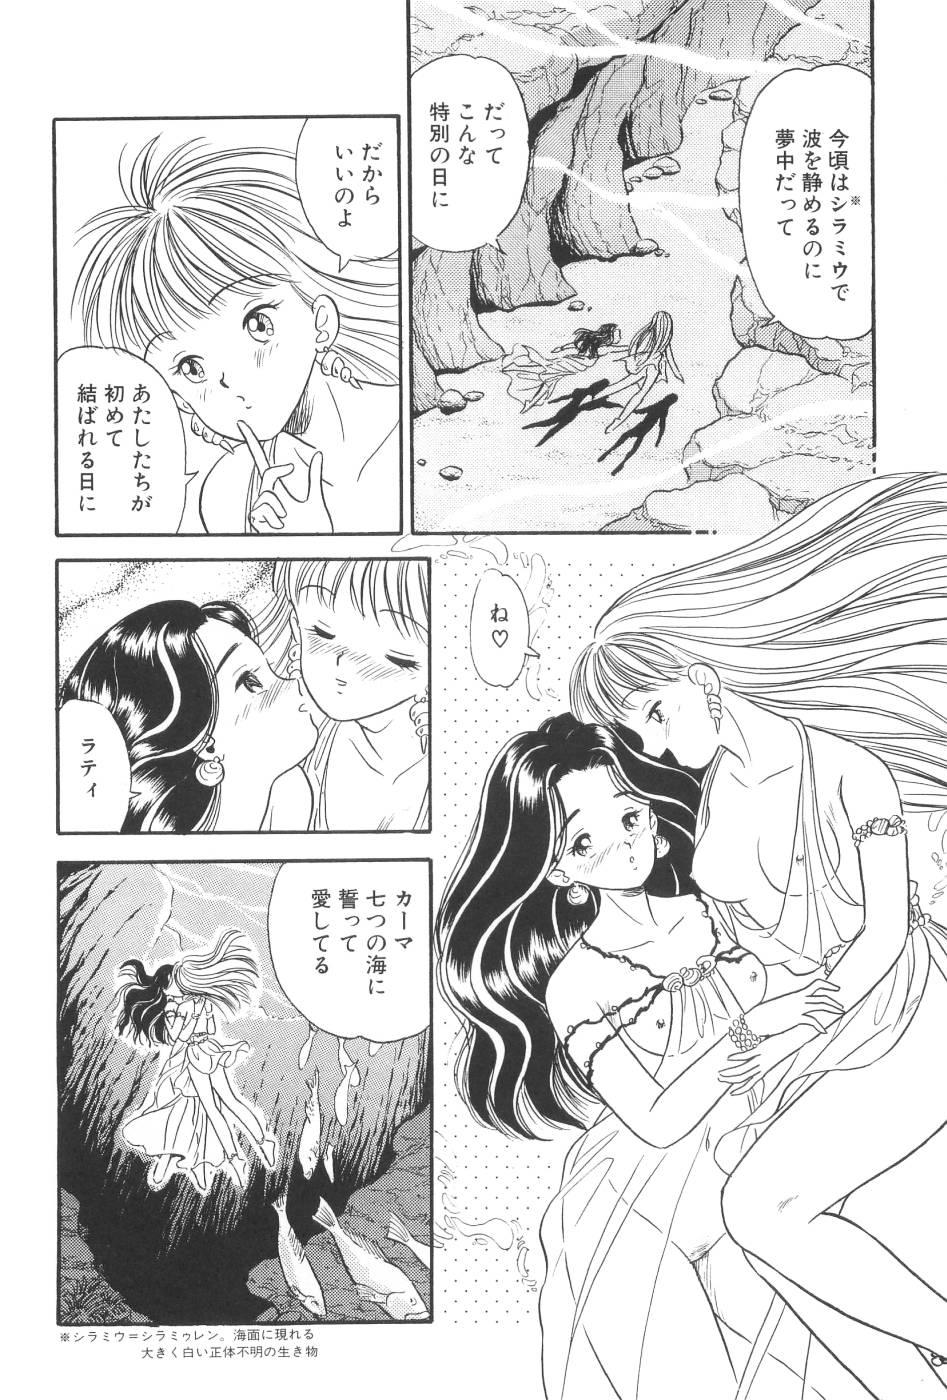 Namioto Densetsu 57